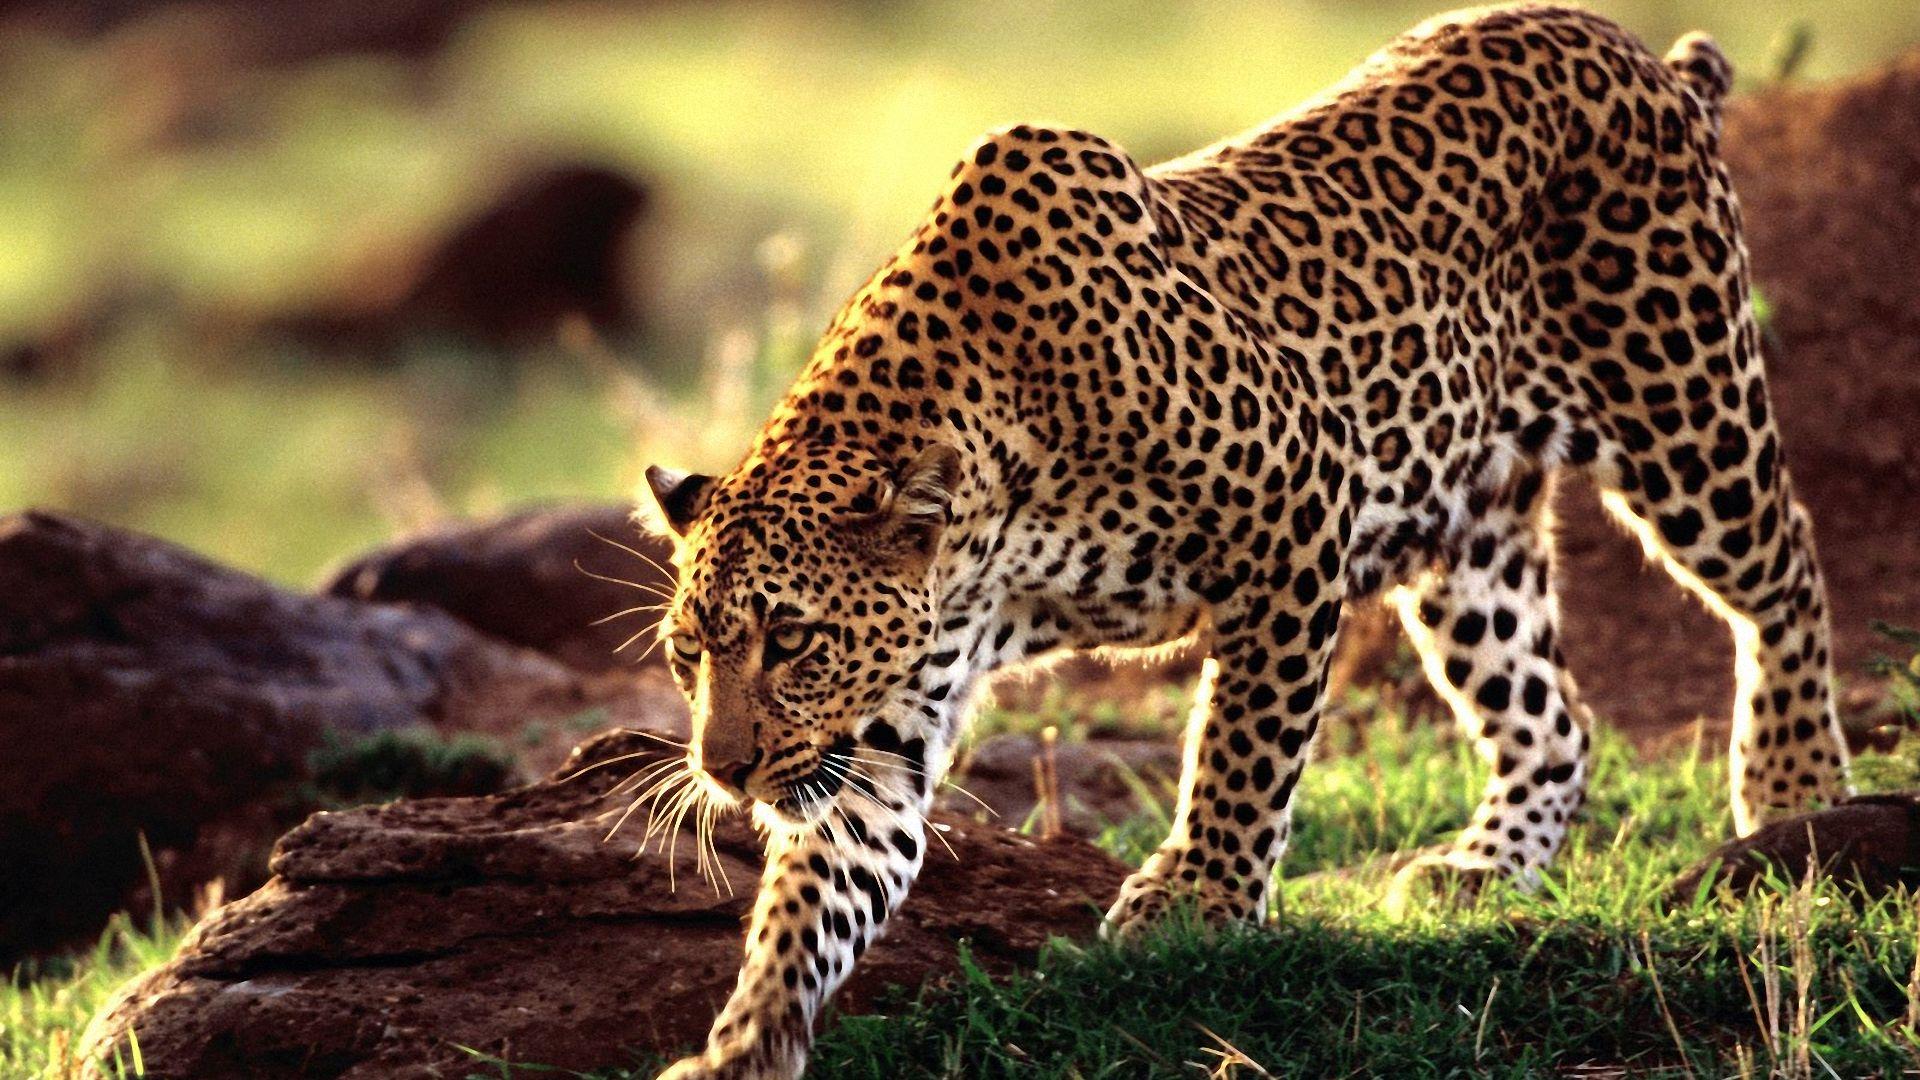 Leopard Wallpaper 1920x1080 WallpapersLeopard 1920x1080 Wallpapers 1920x1080